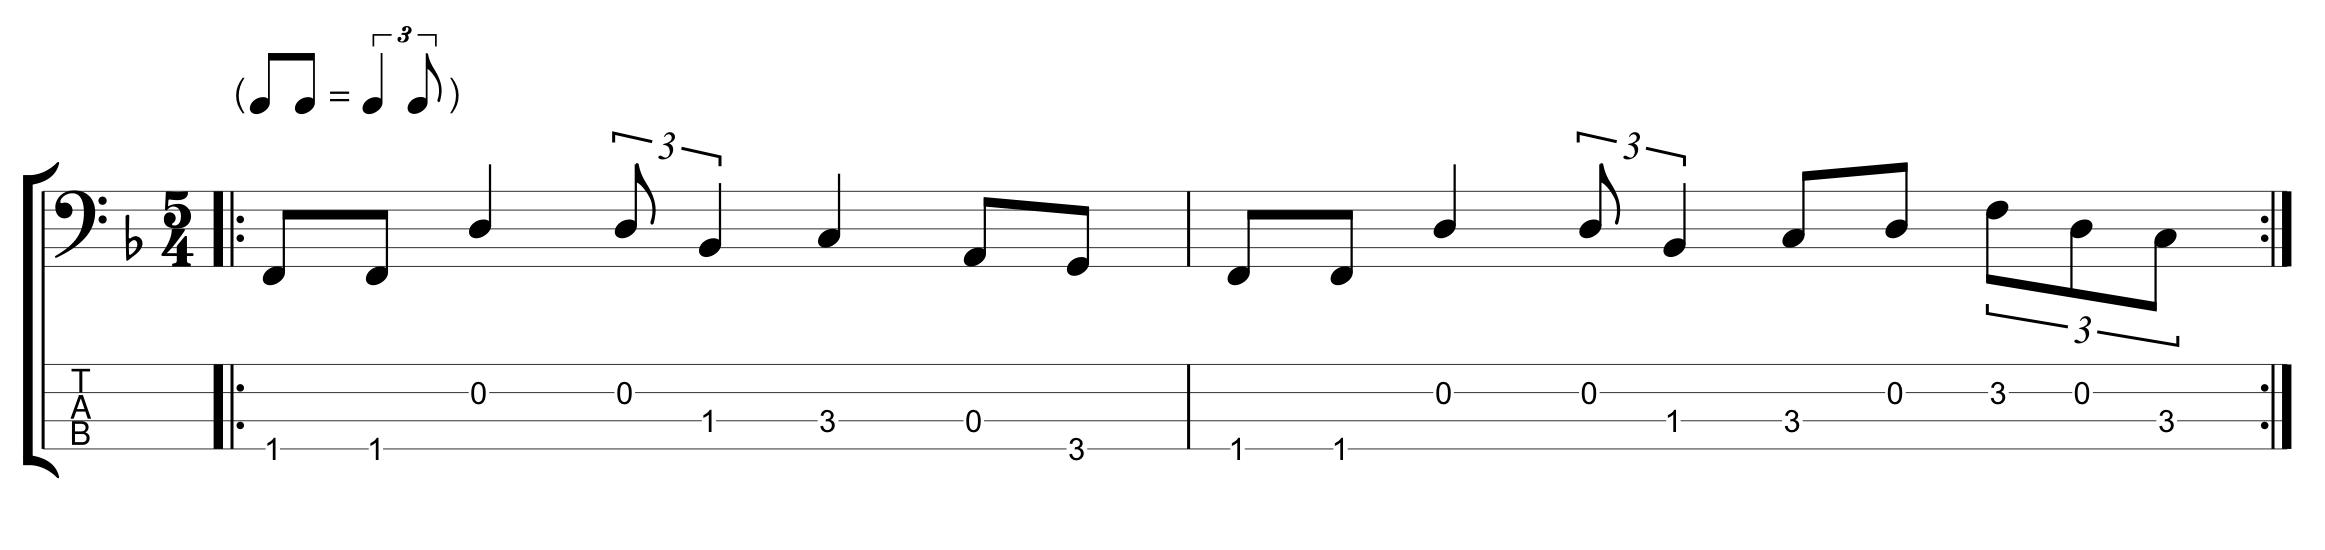 Odd Meter 5/4 Shuffle